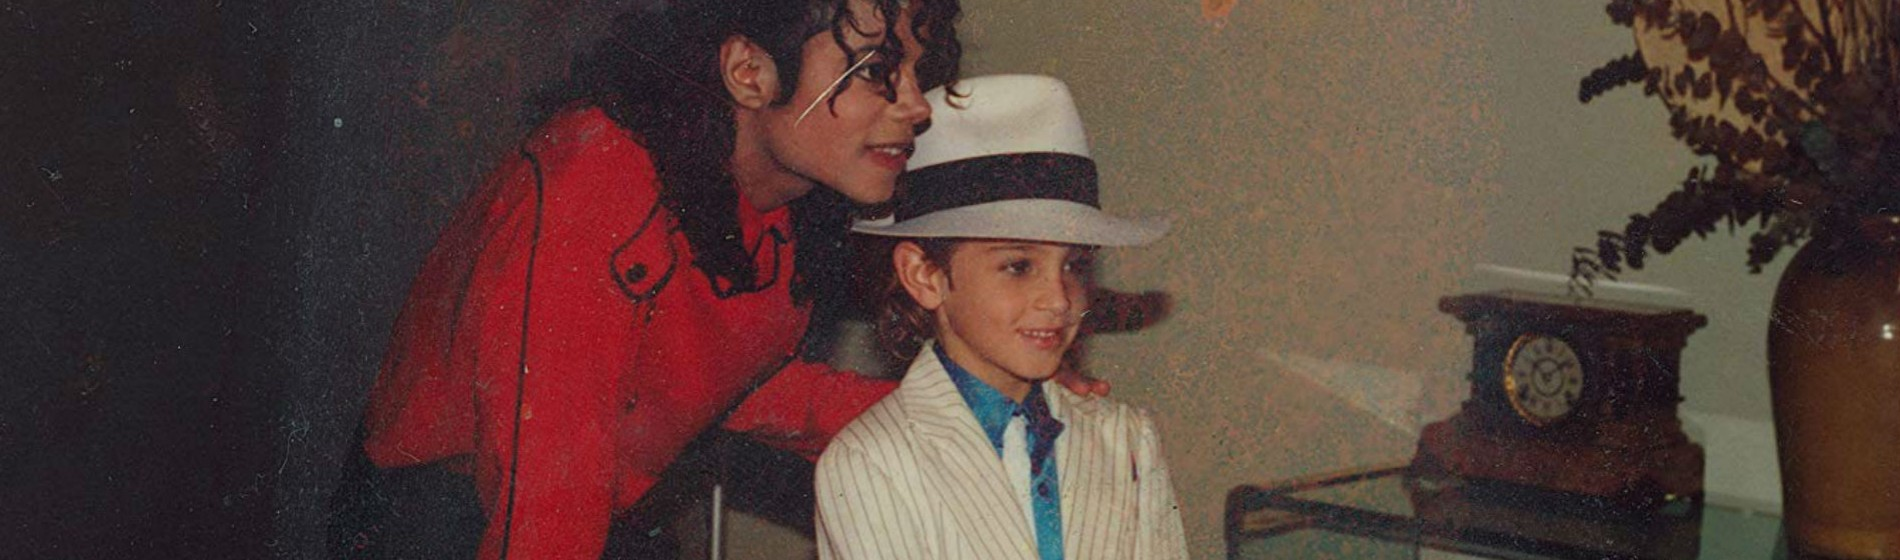 Leaving-Neverland-Michael-Jackson-Red Shirt